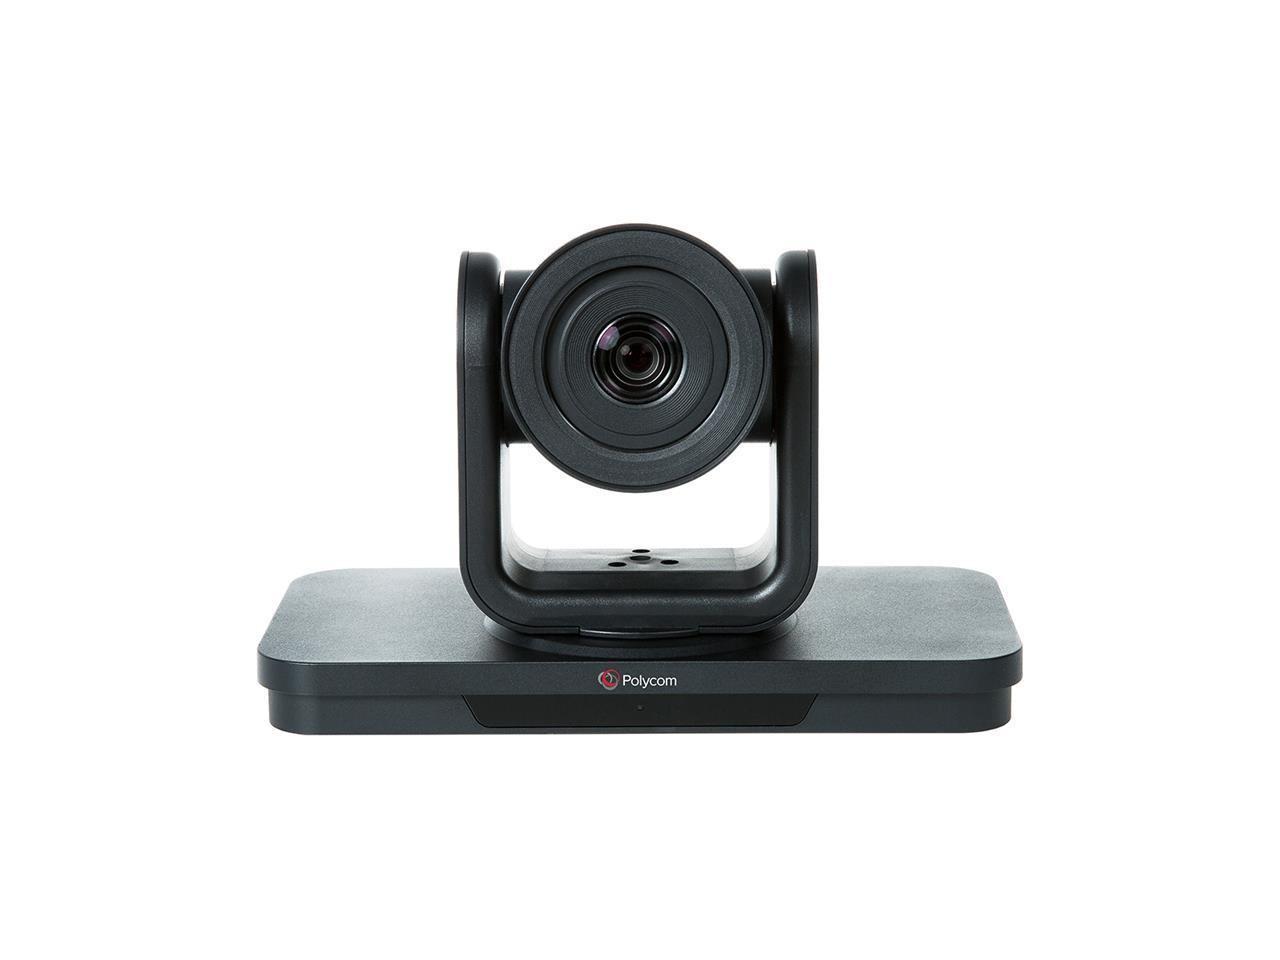 Polycom EagleEye IV 4x Video Conferencing Camera 8200-64370-001 Black Body